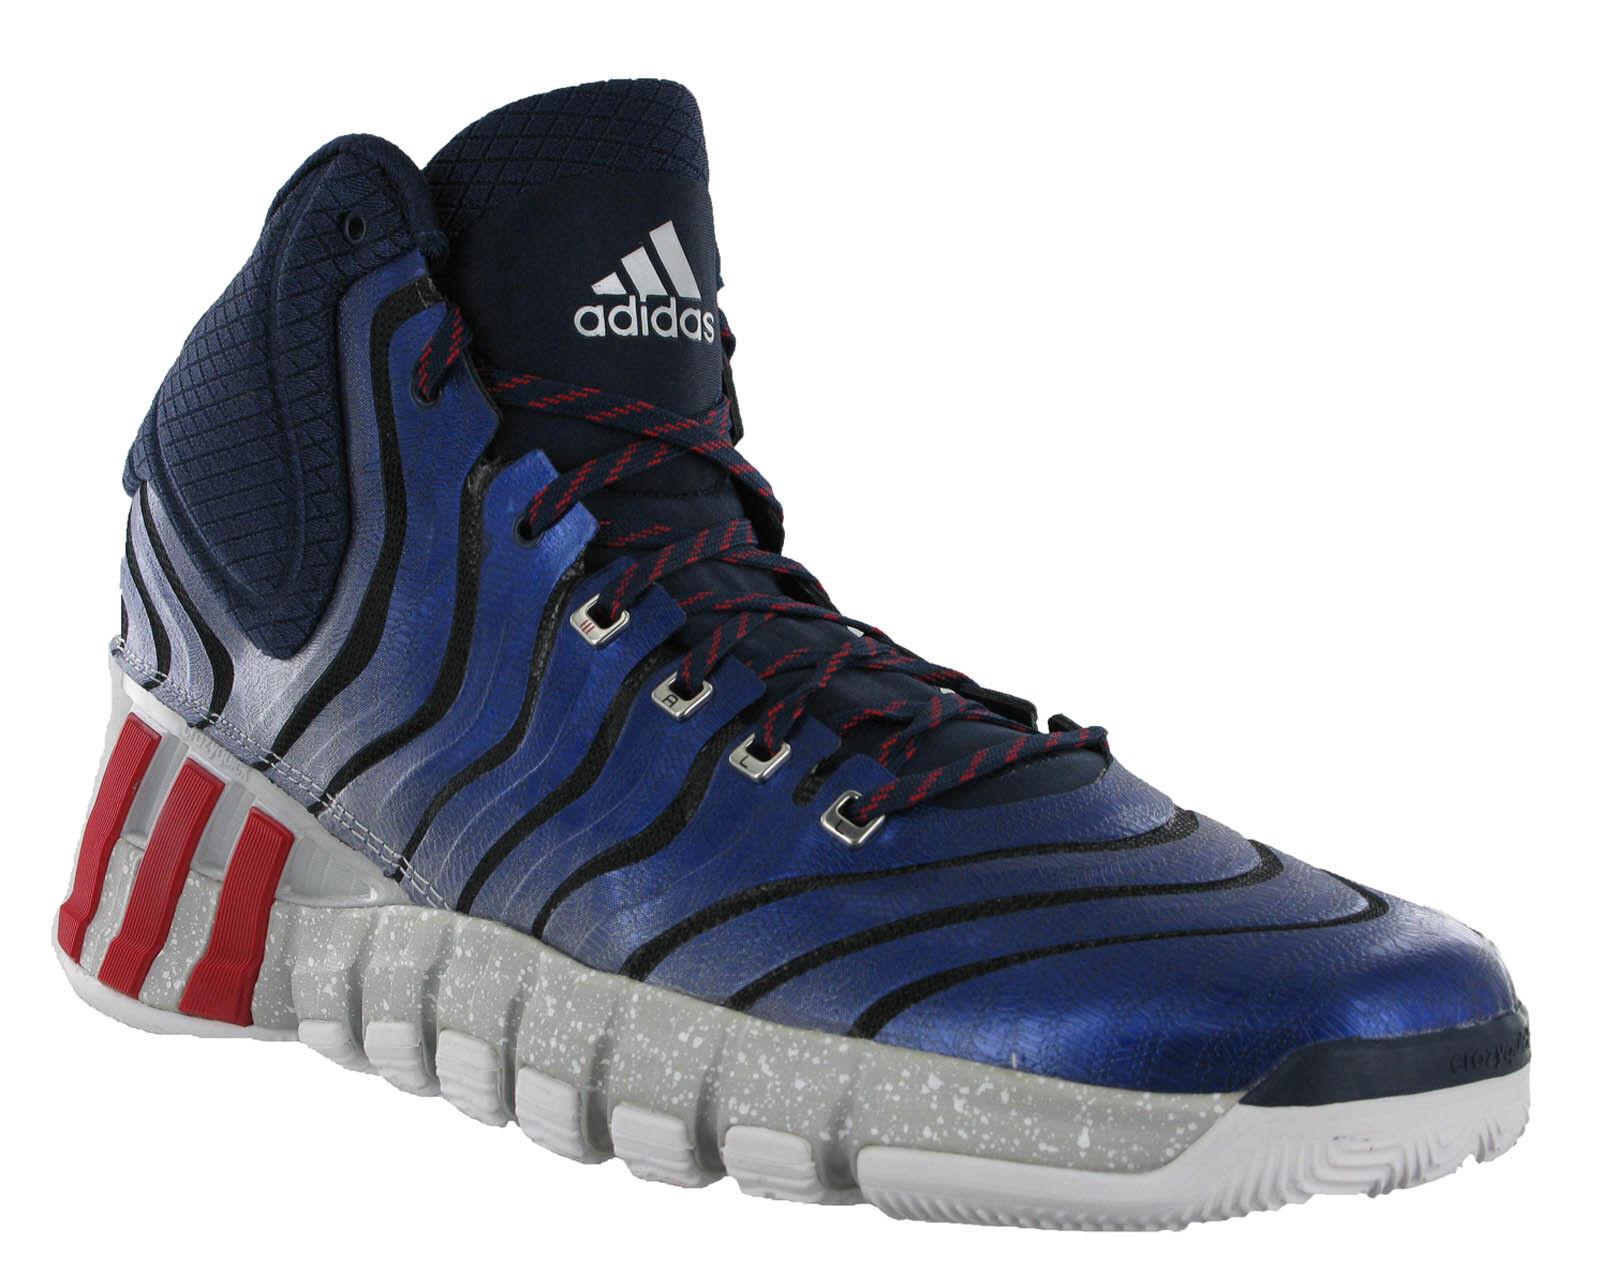 fcccc78326a552 Adidas Adipure Adipure Adipure Crazyquick 2 Hohe Basketball Herren  Turnschuhe Stiefel UK 12 - 15 a56de2